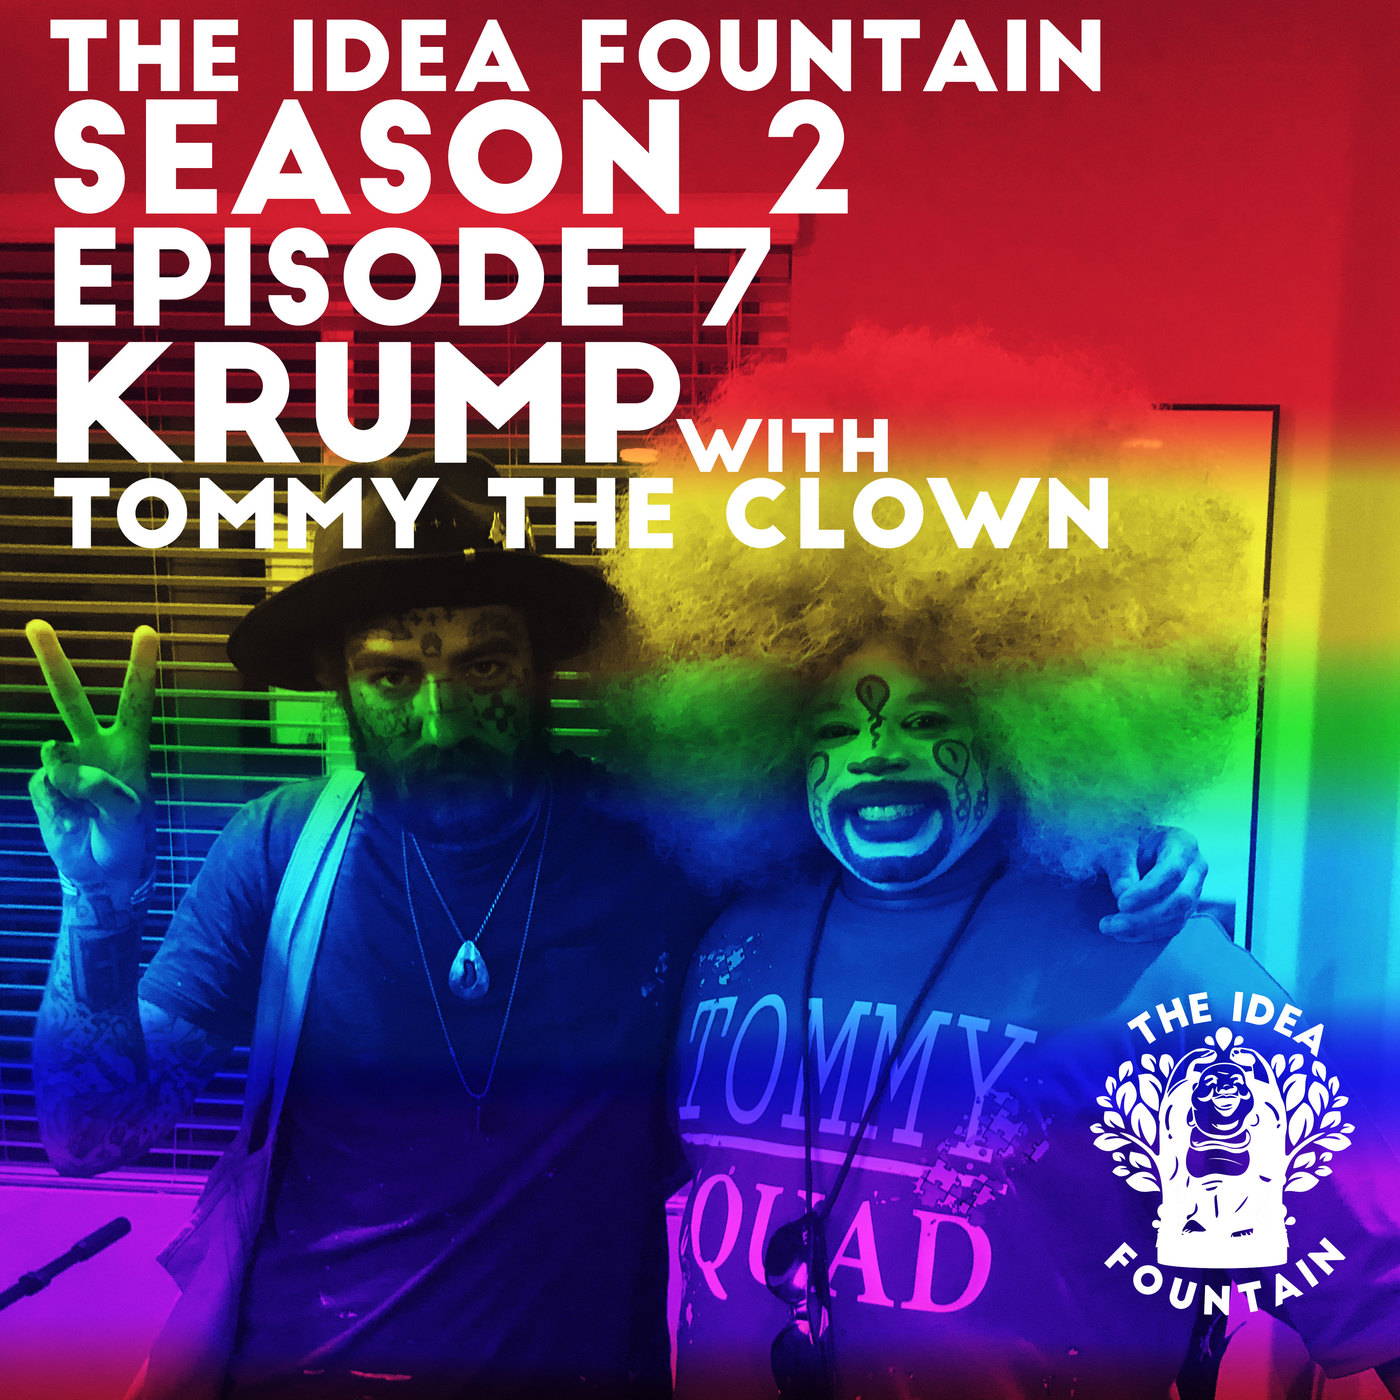 The Idea Fountain S2 Ep 7: Krump with Tommy the Clown